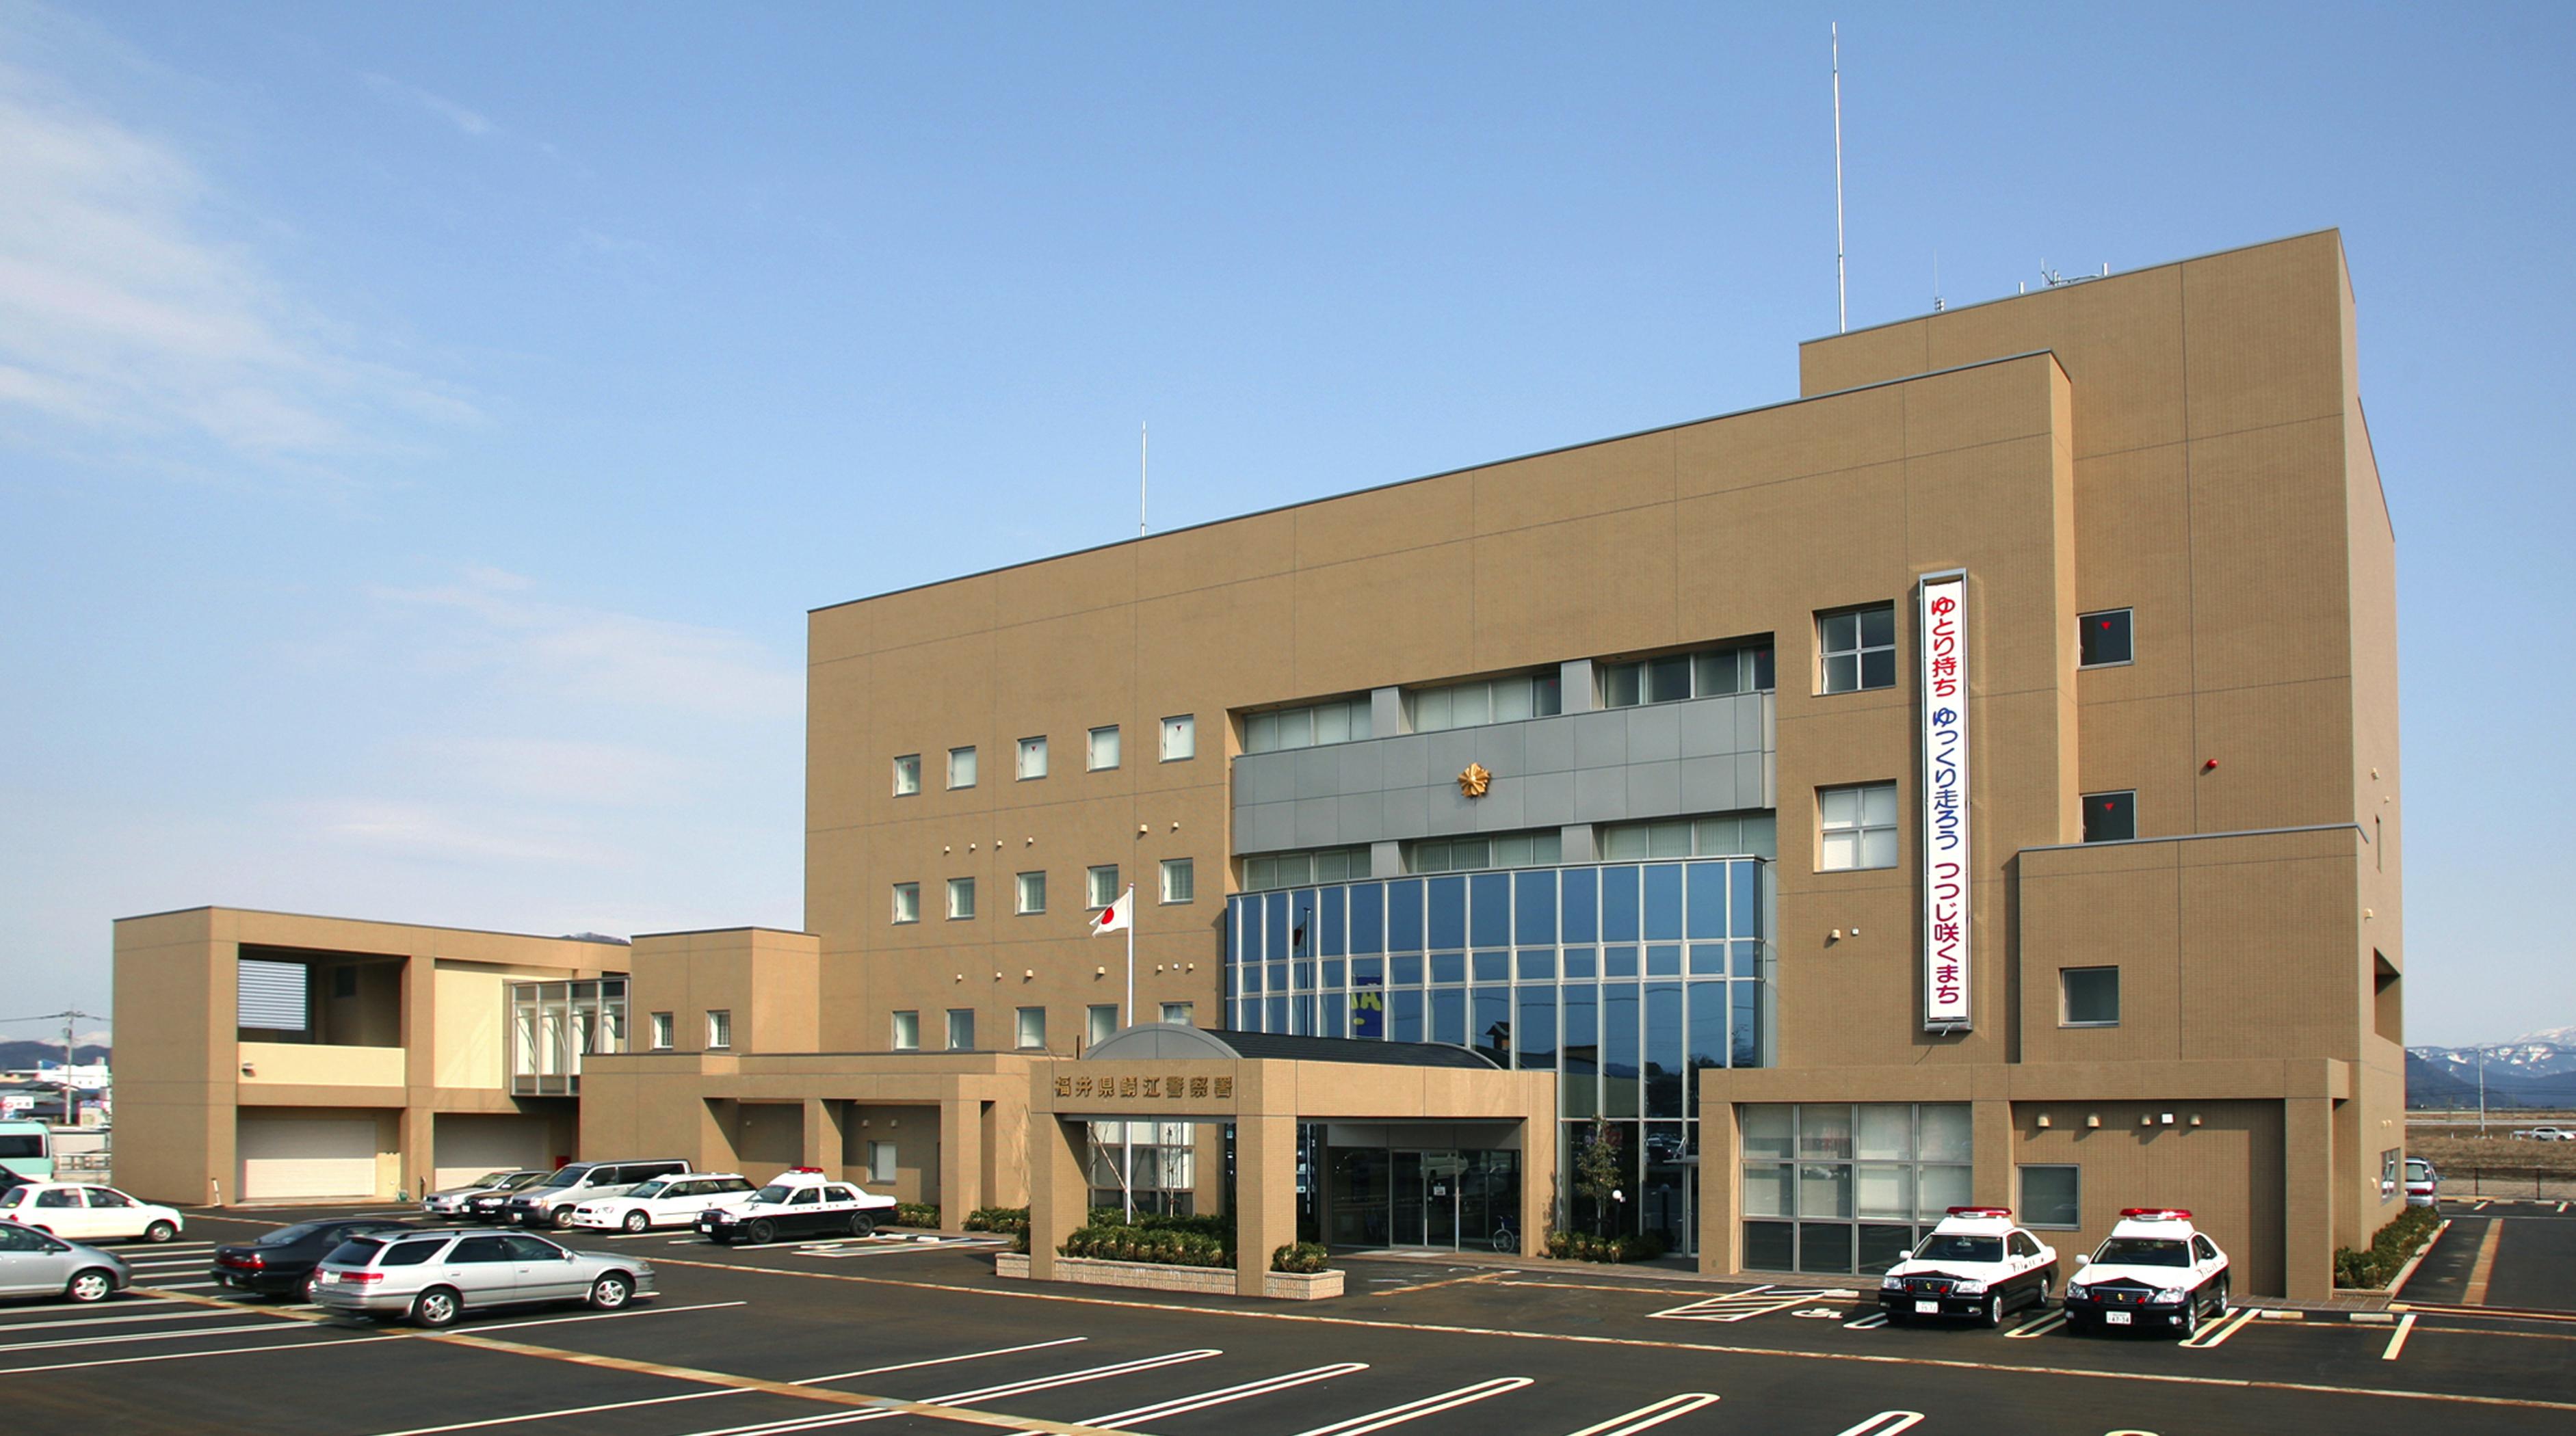 福井県鯖江警察署庁舎イメージ